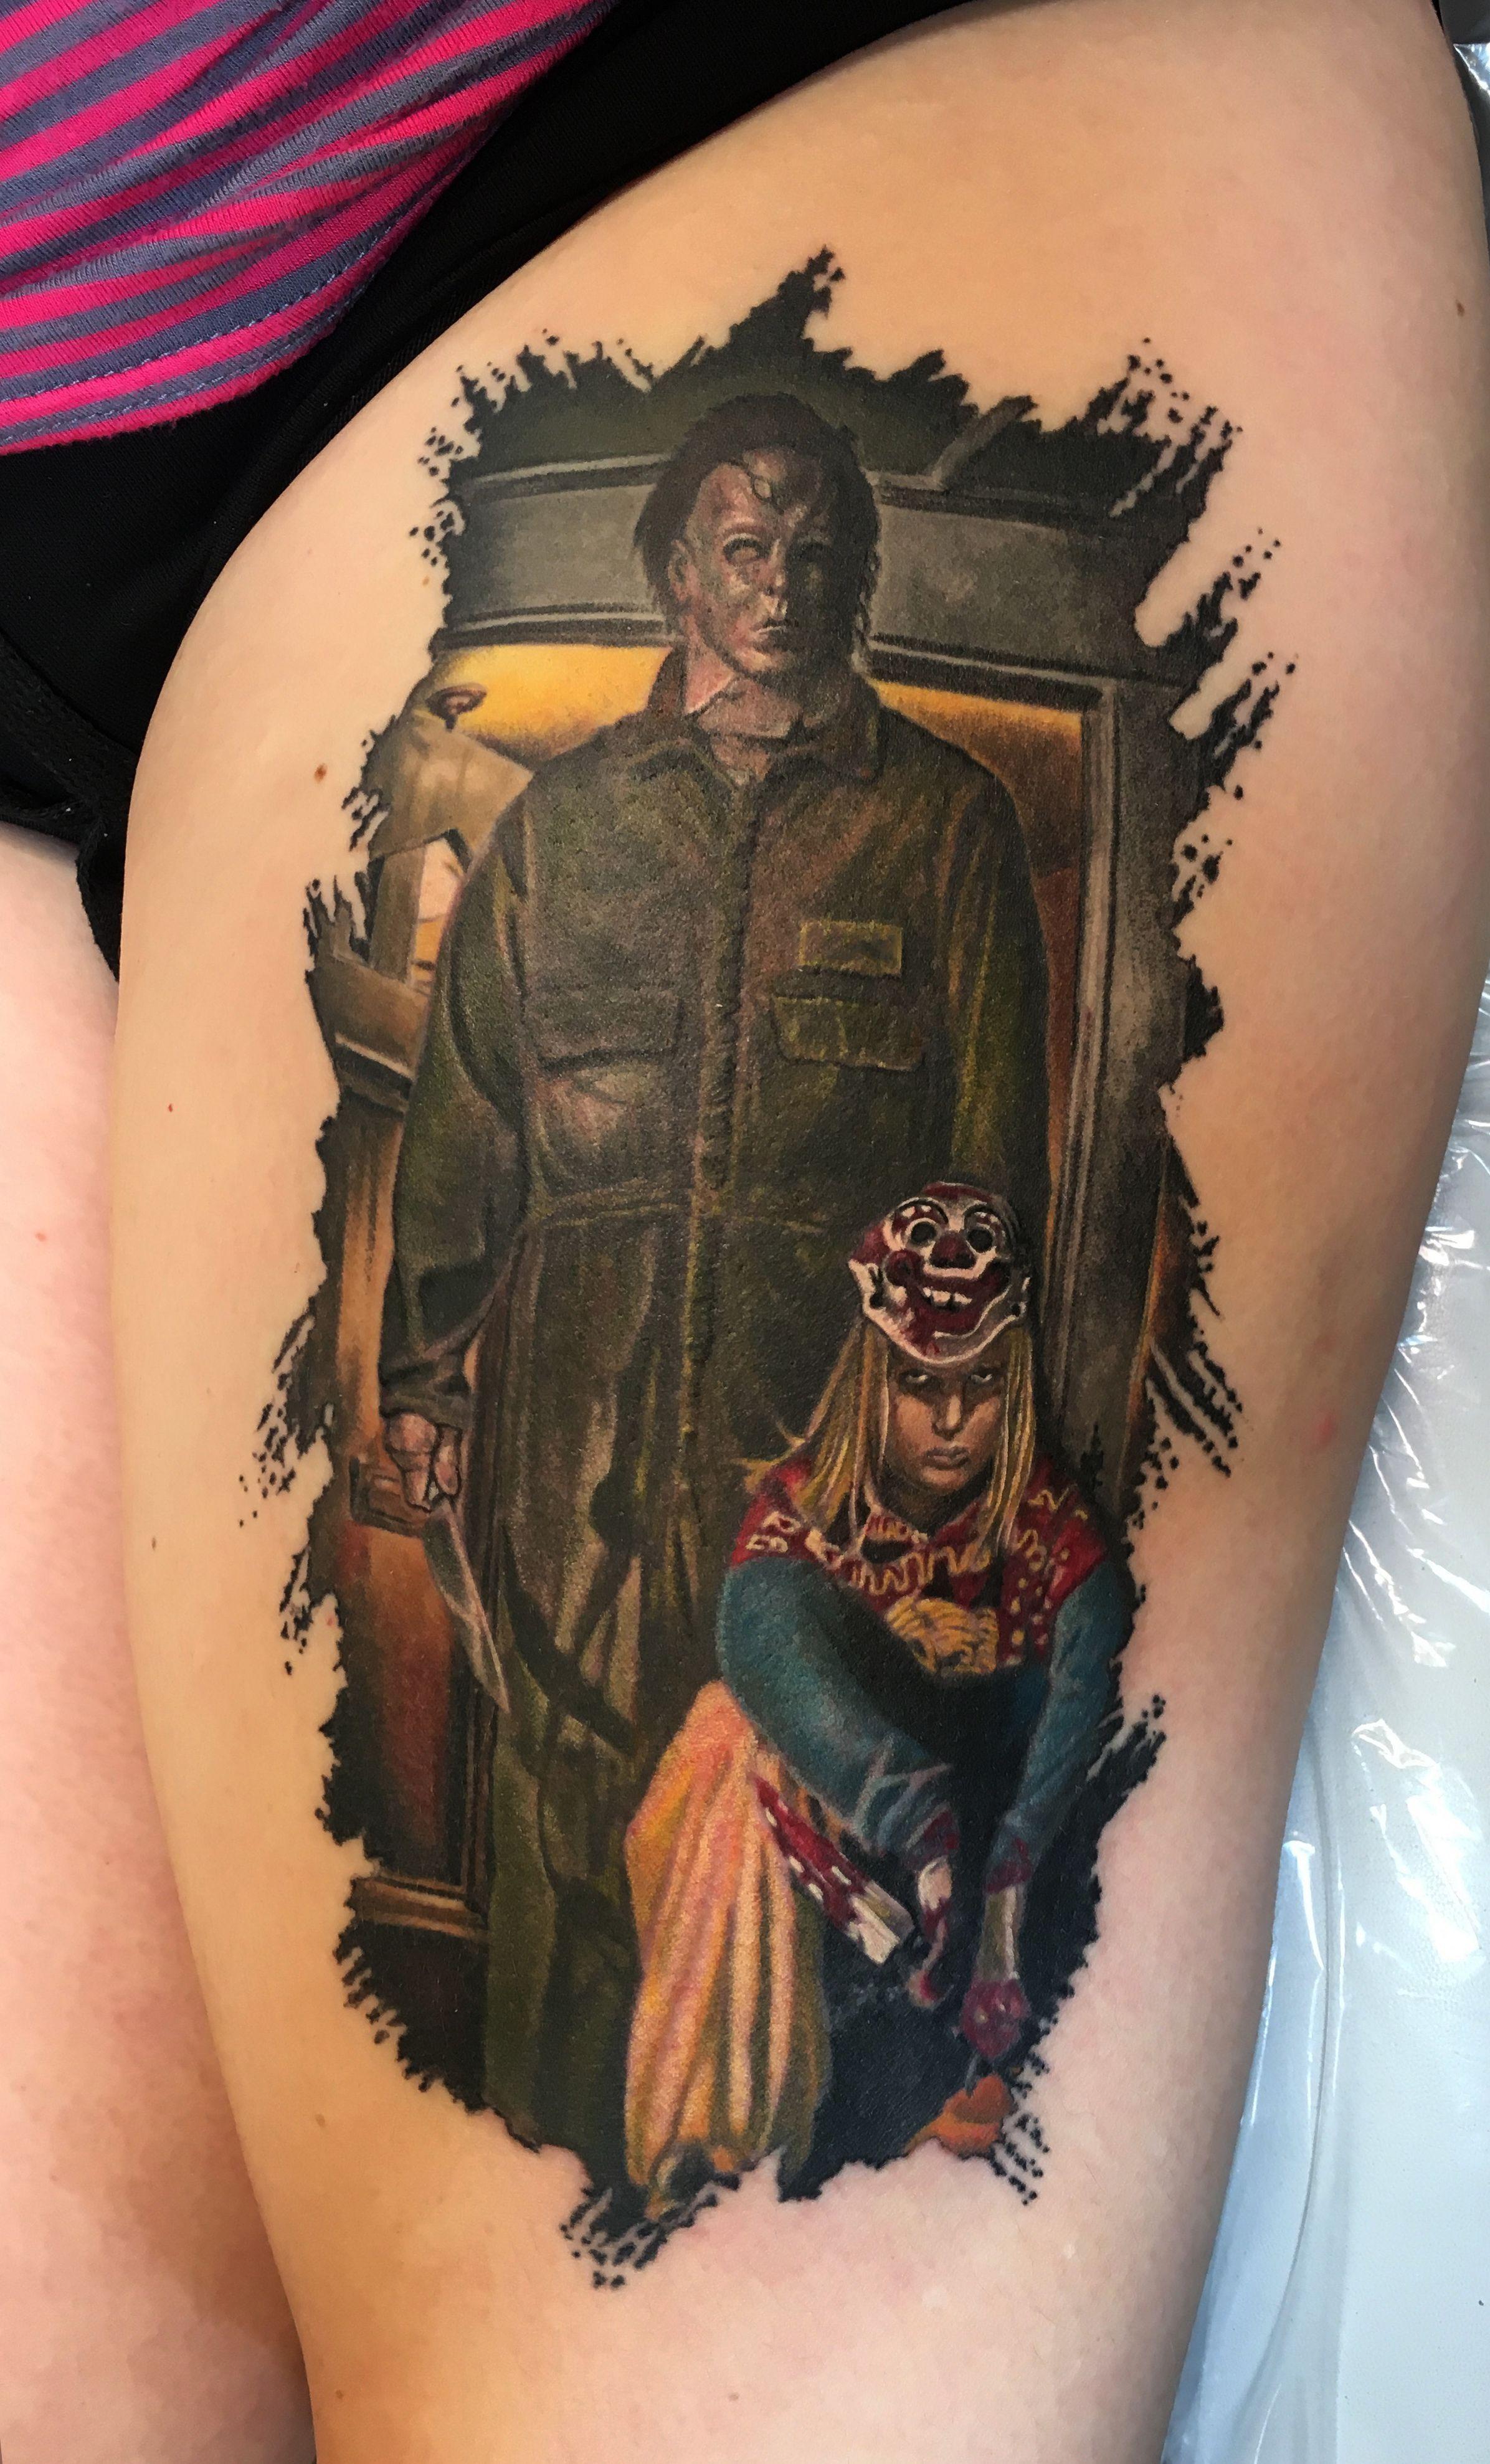 Halloween 2020 Michael Myers Won'T Be Immortal Immortal Images Steve Huntsberry Tattoos Michael Myers Halloween